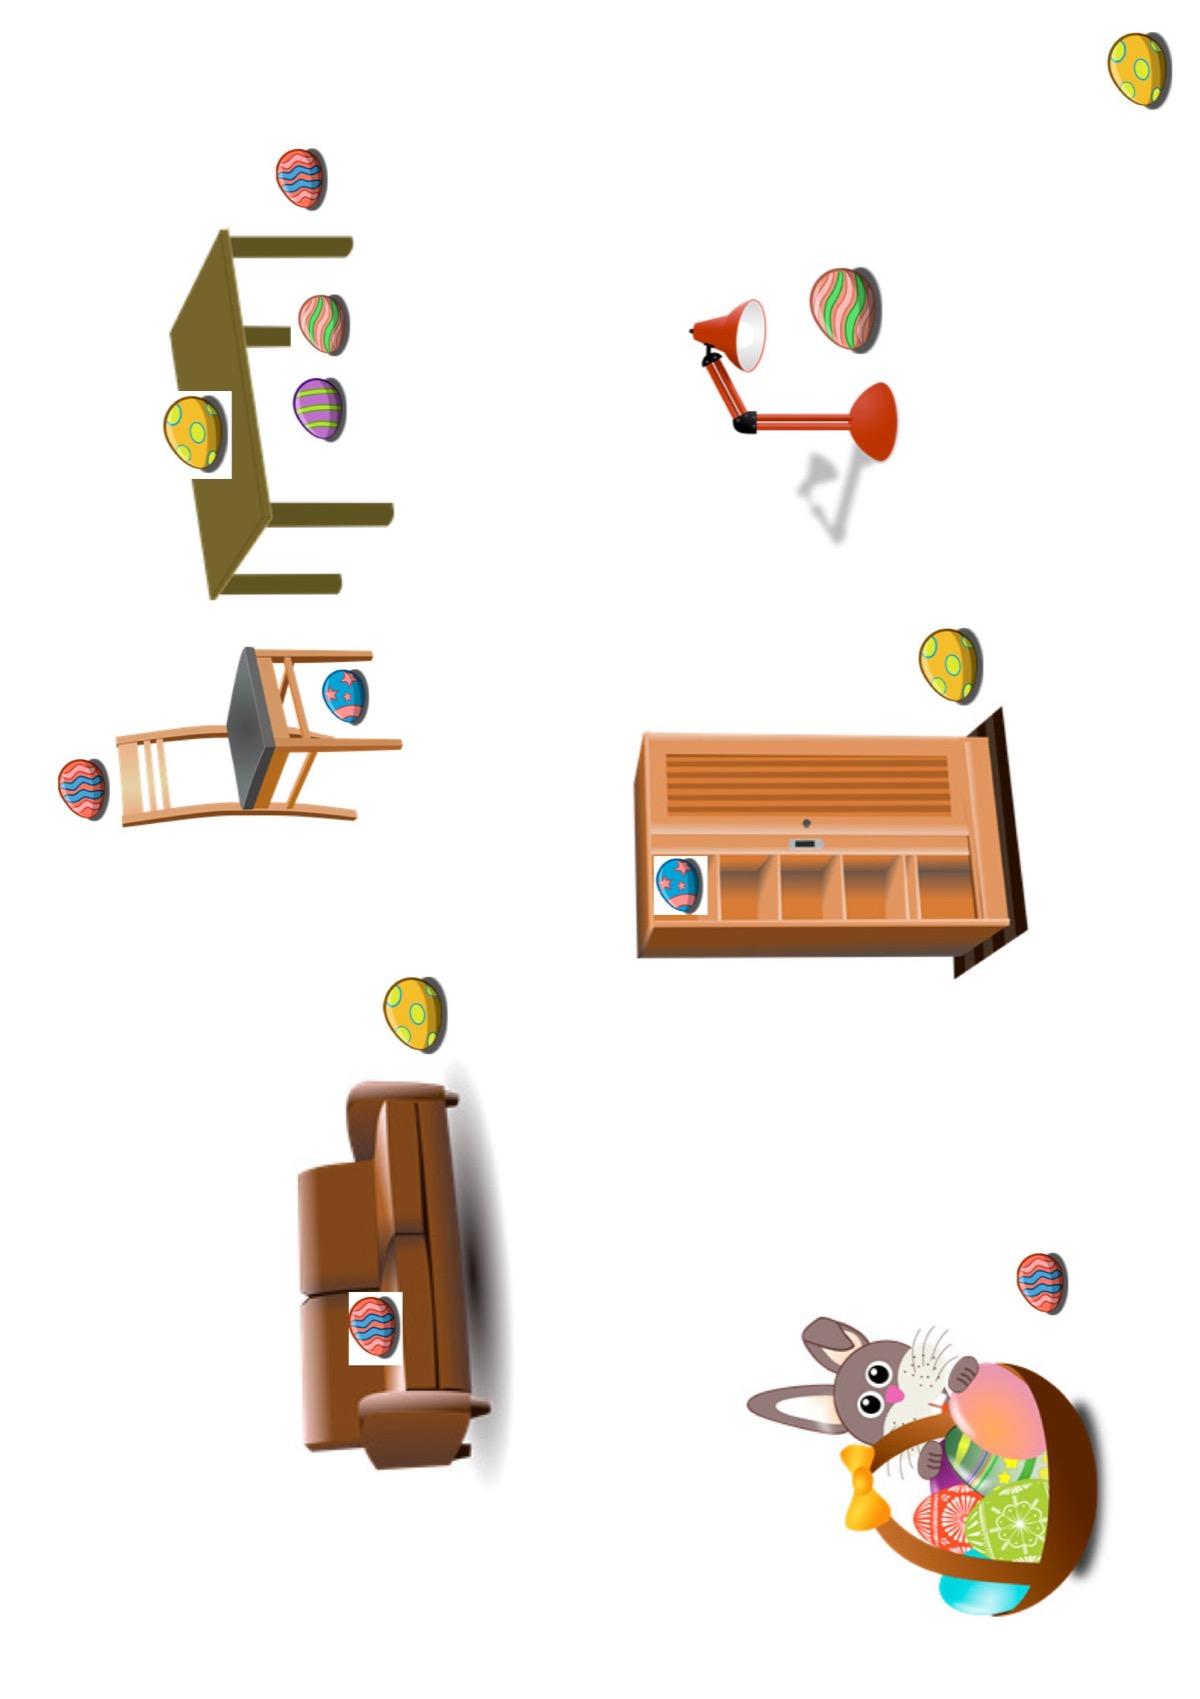 Ostereiersuche - Kindersprache - madoo.net